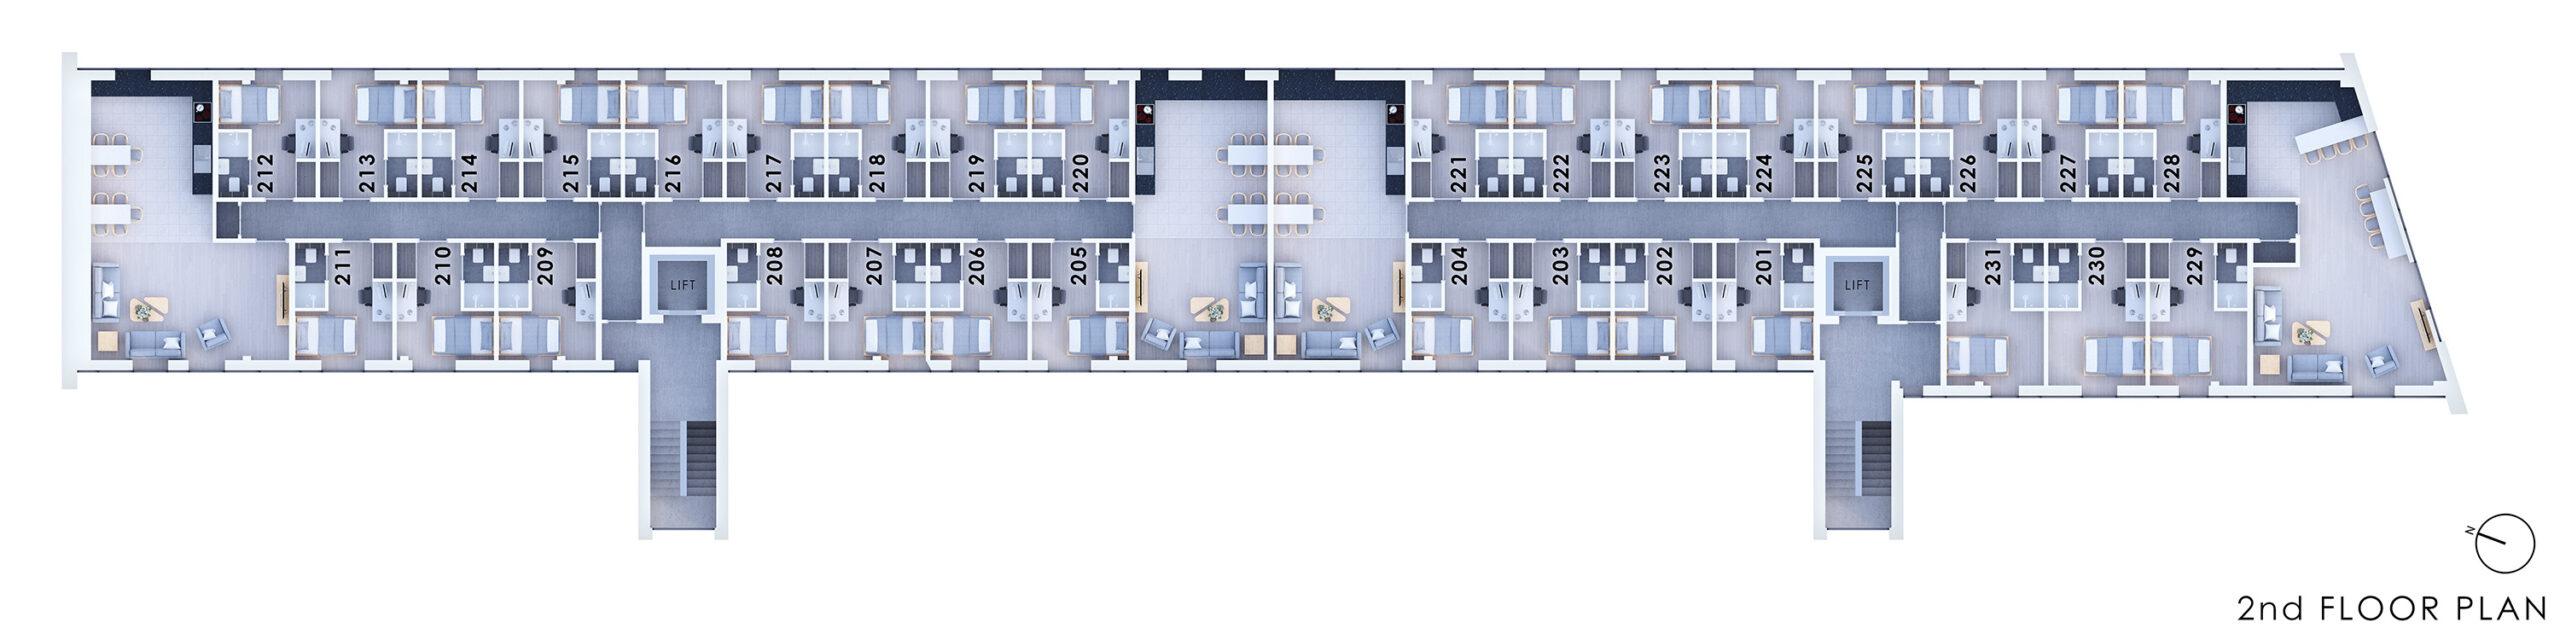 City Point 2nd Floor Plan